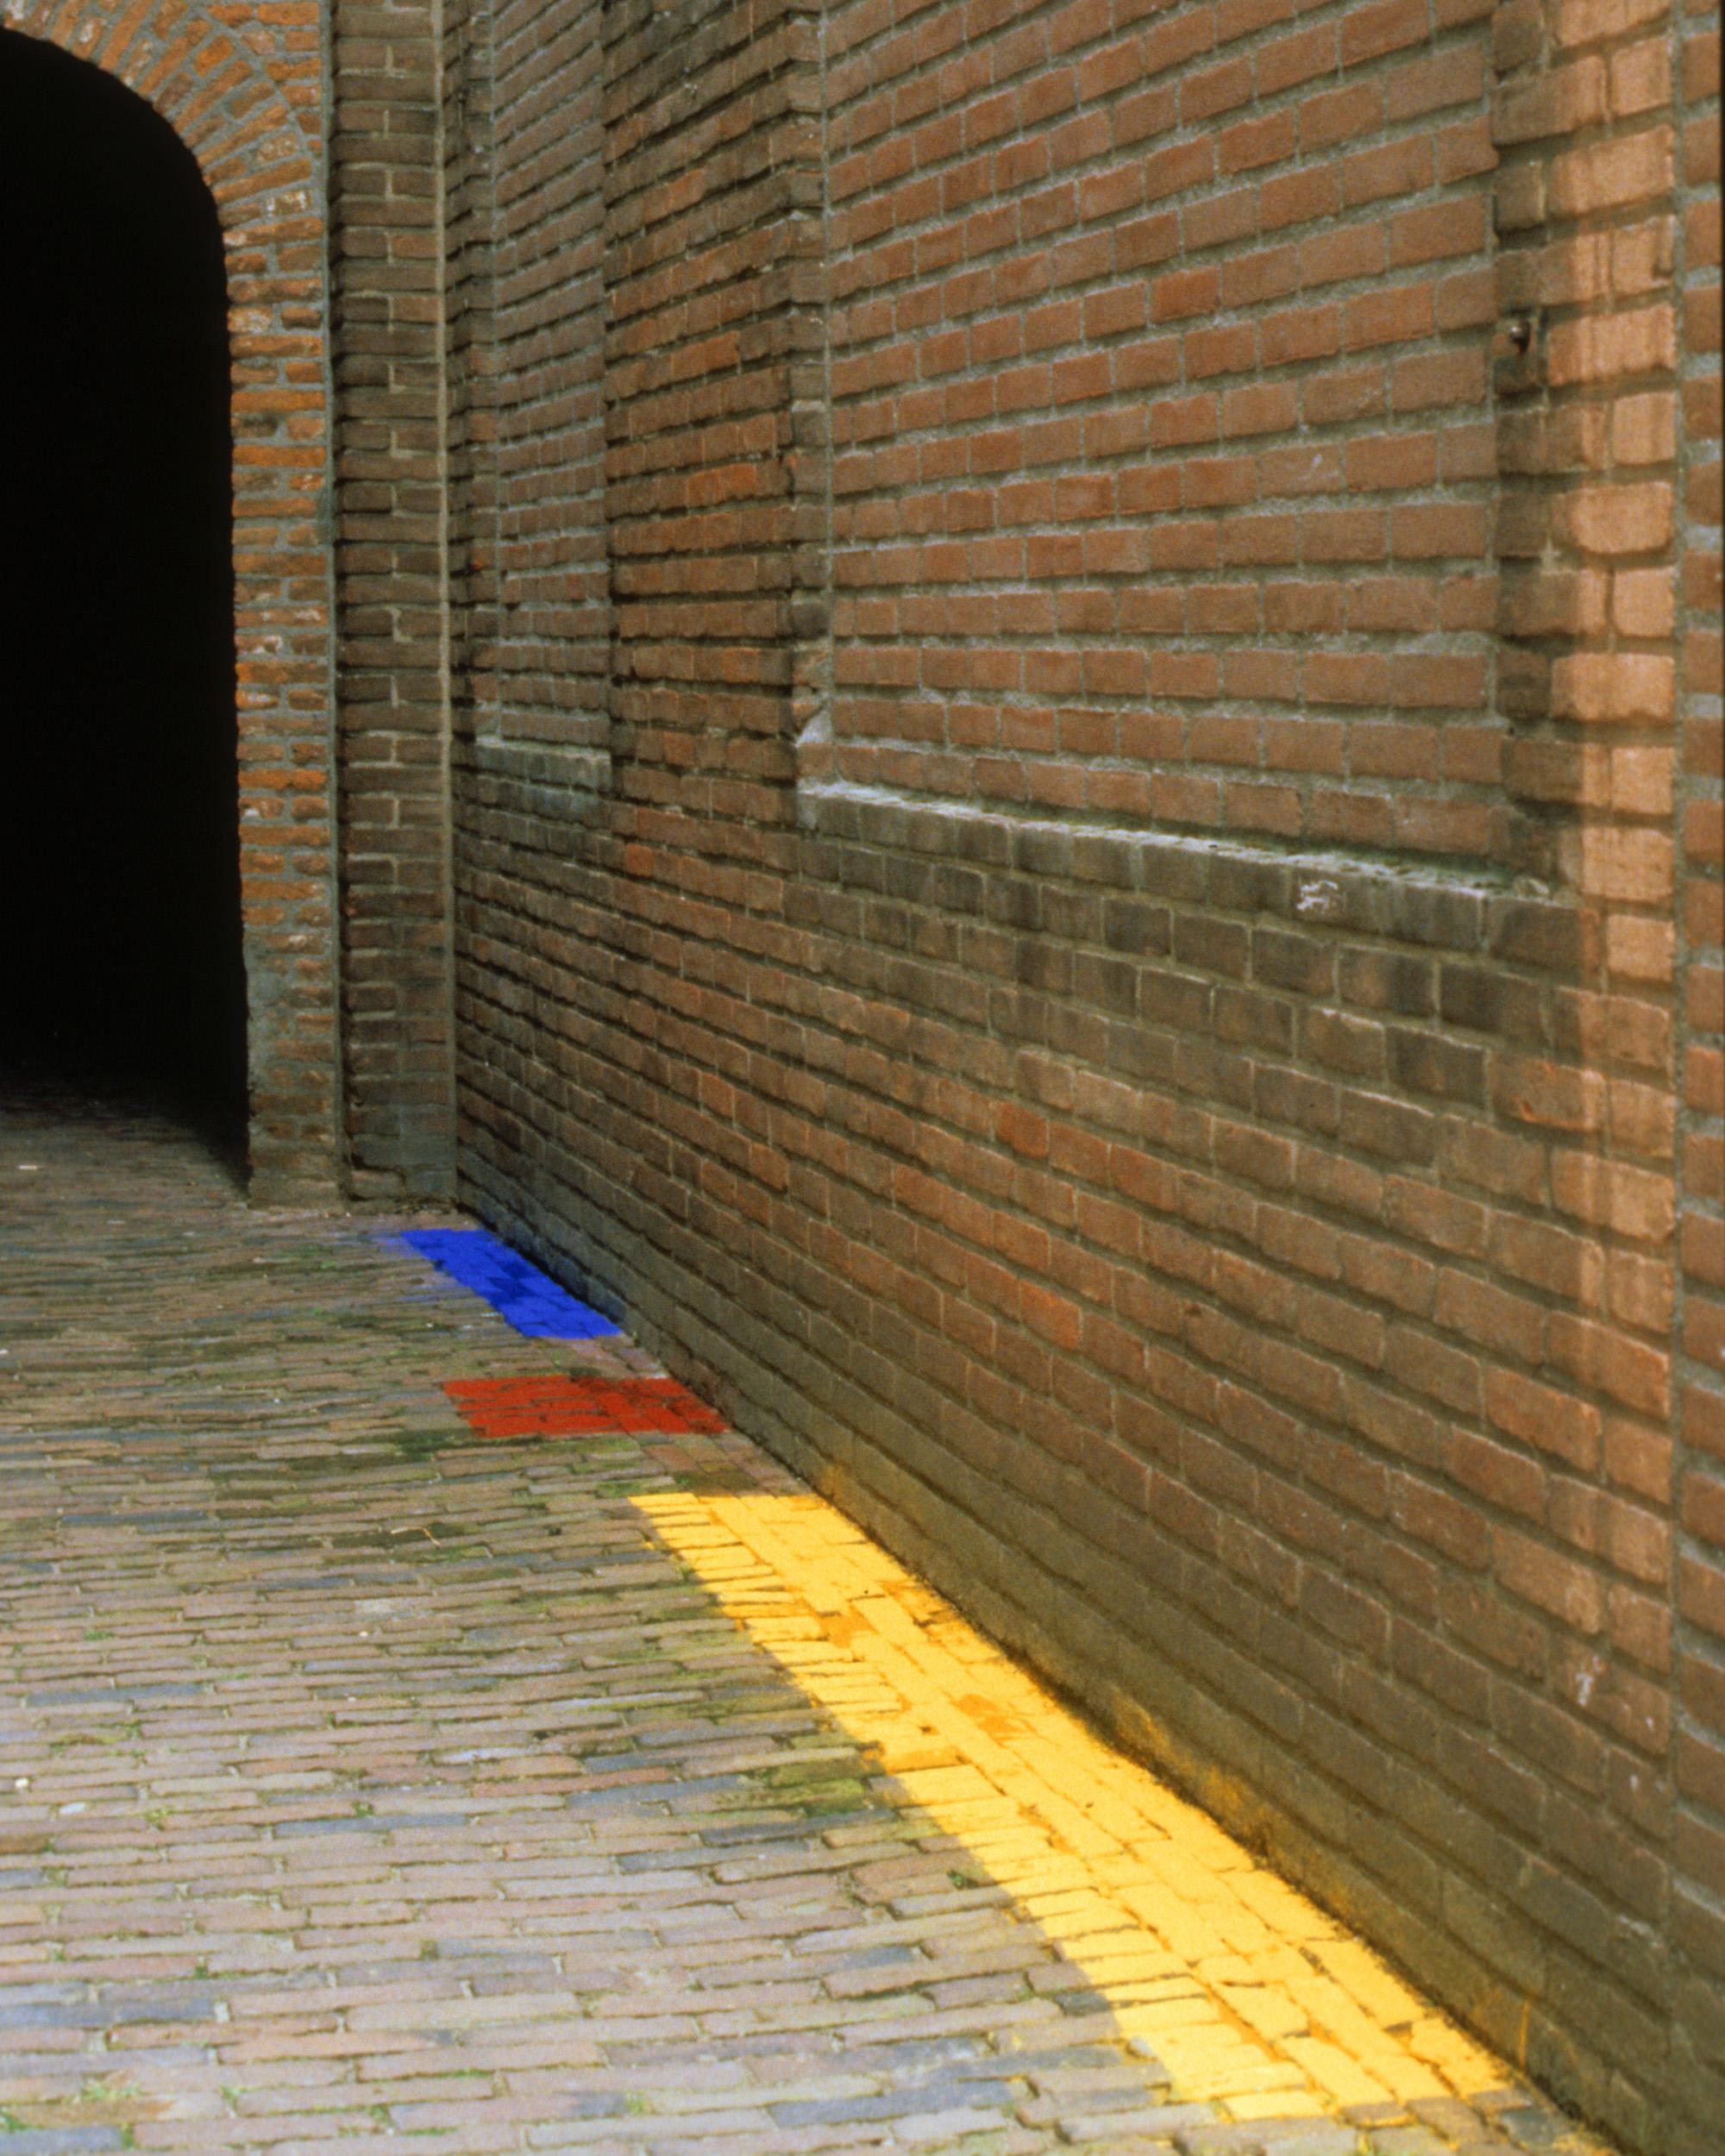 Installation, s'Hertogenbosch, NL, 1997  Oxides on brick, dimensions variable